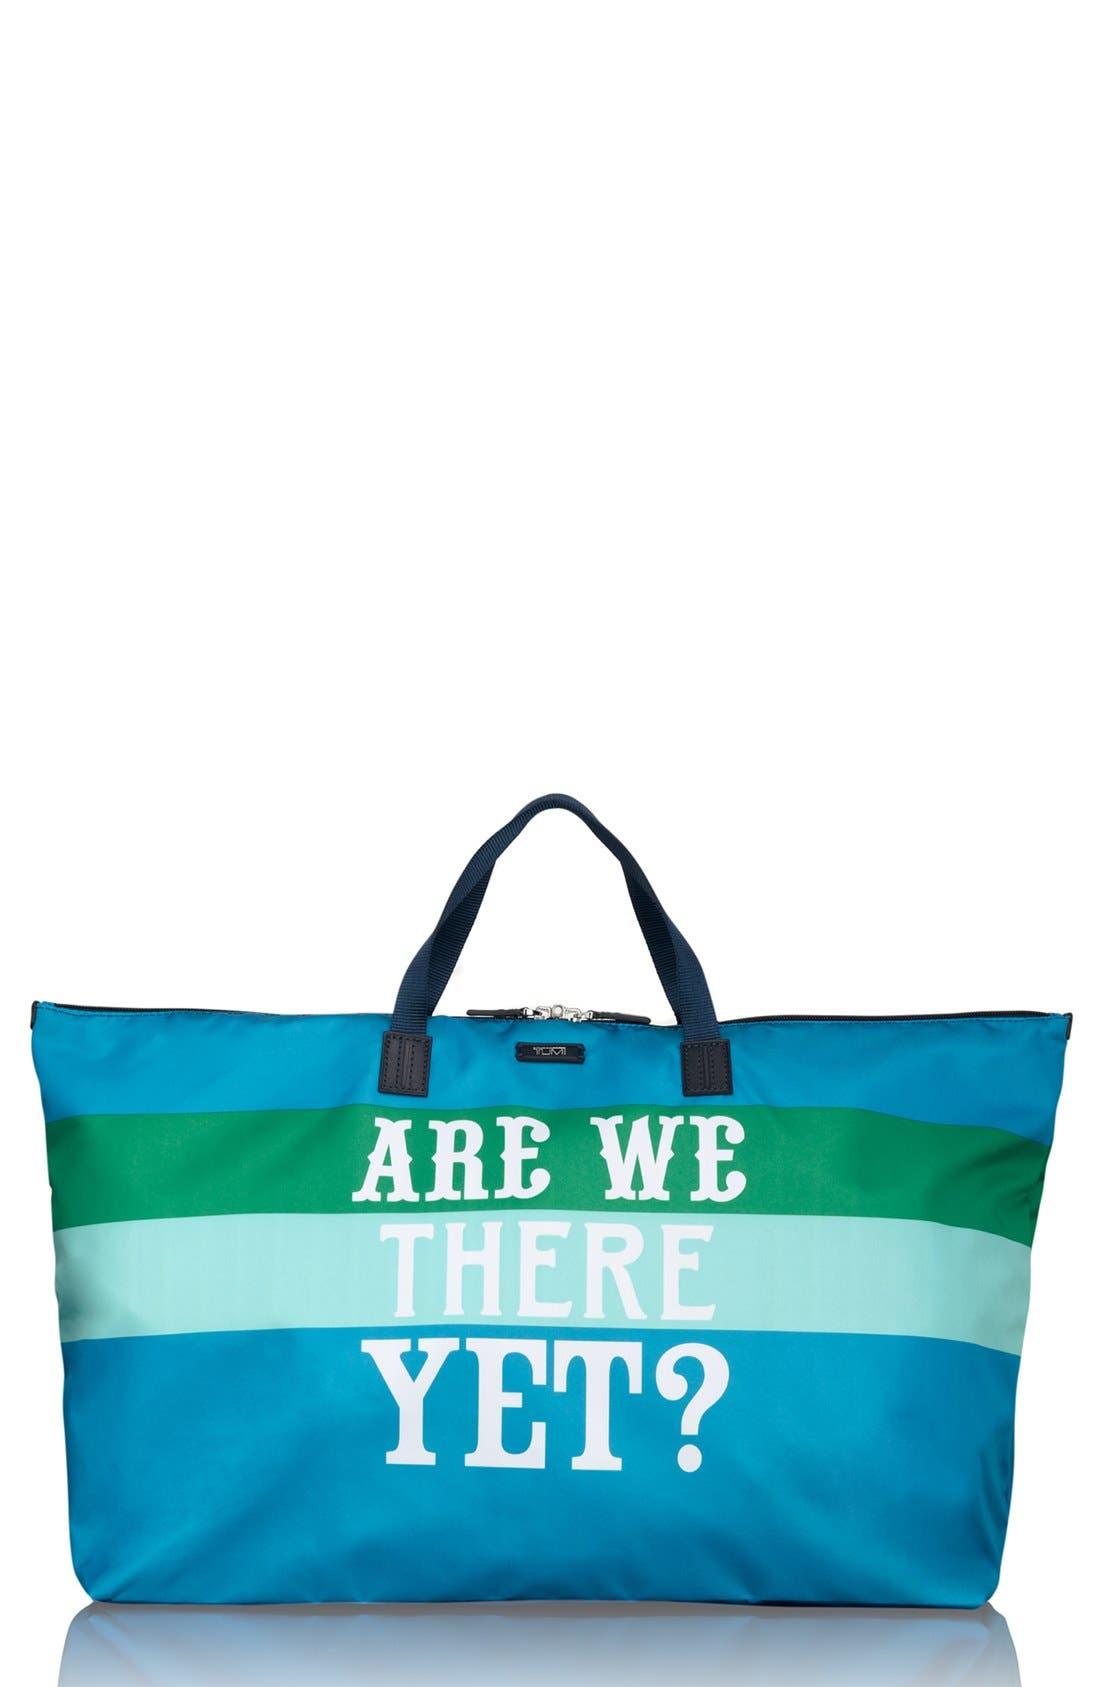 Main Image - Tumi 'Are We There Yet?' Nylon Tote